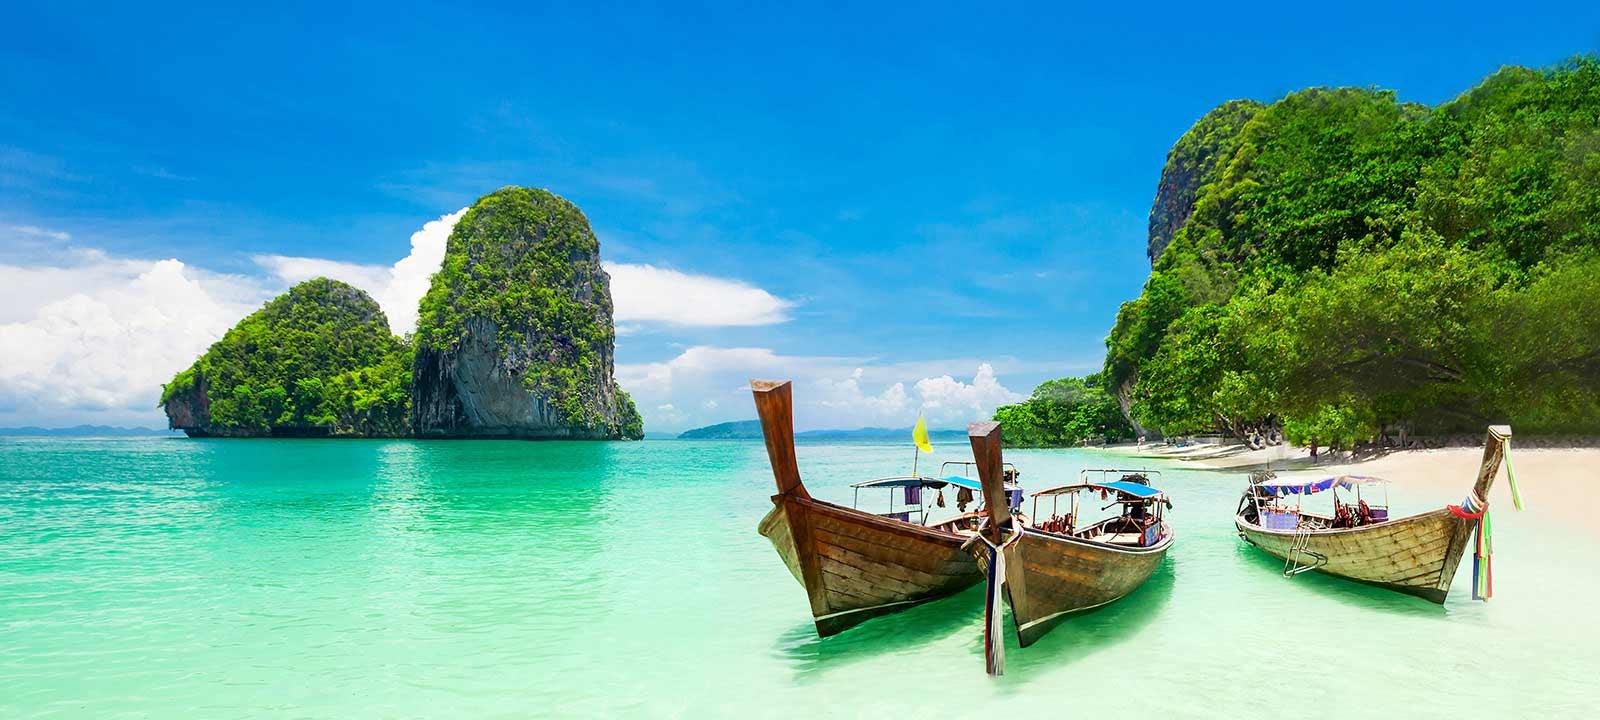 Krabi, Voyage en Thaïlande avec Asiatica Travel